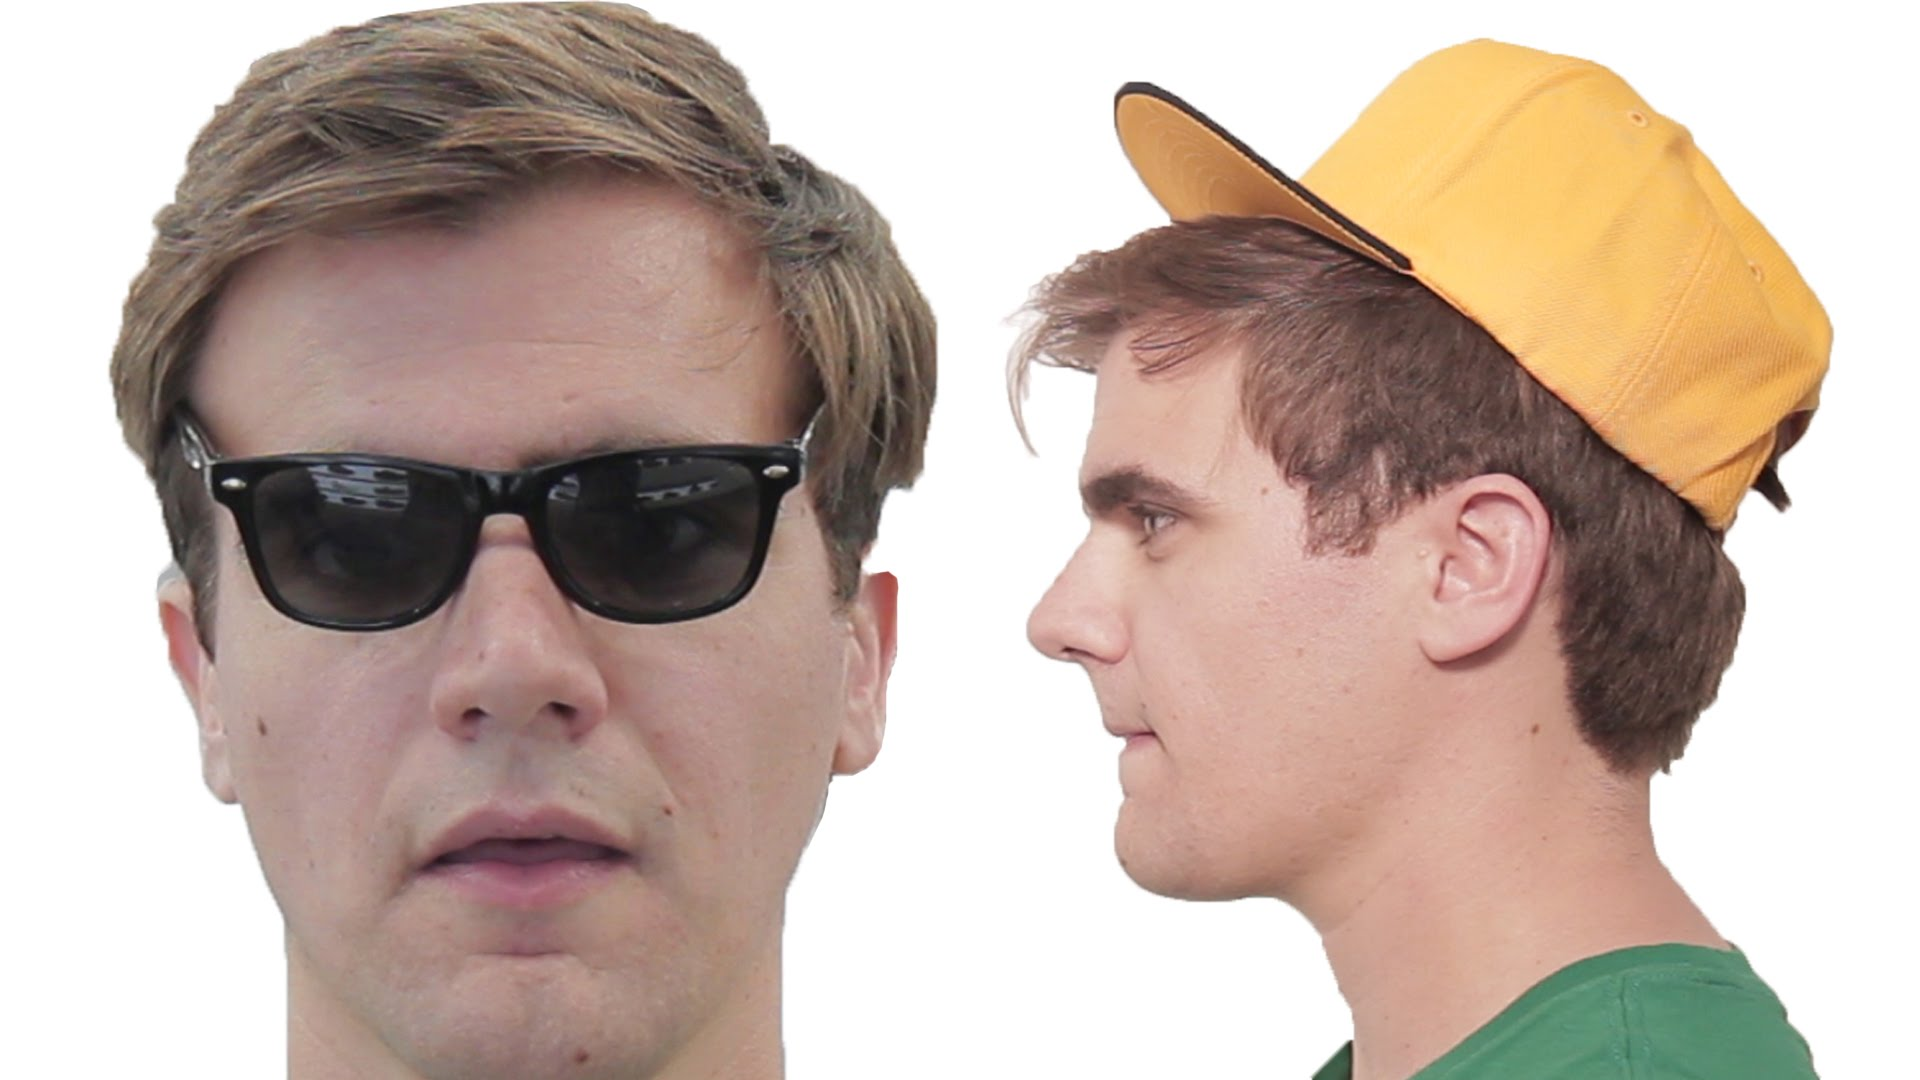 BuzzFeed Video - 11 Big Head Problems d3f0548d58a